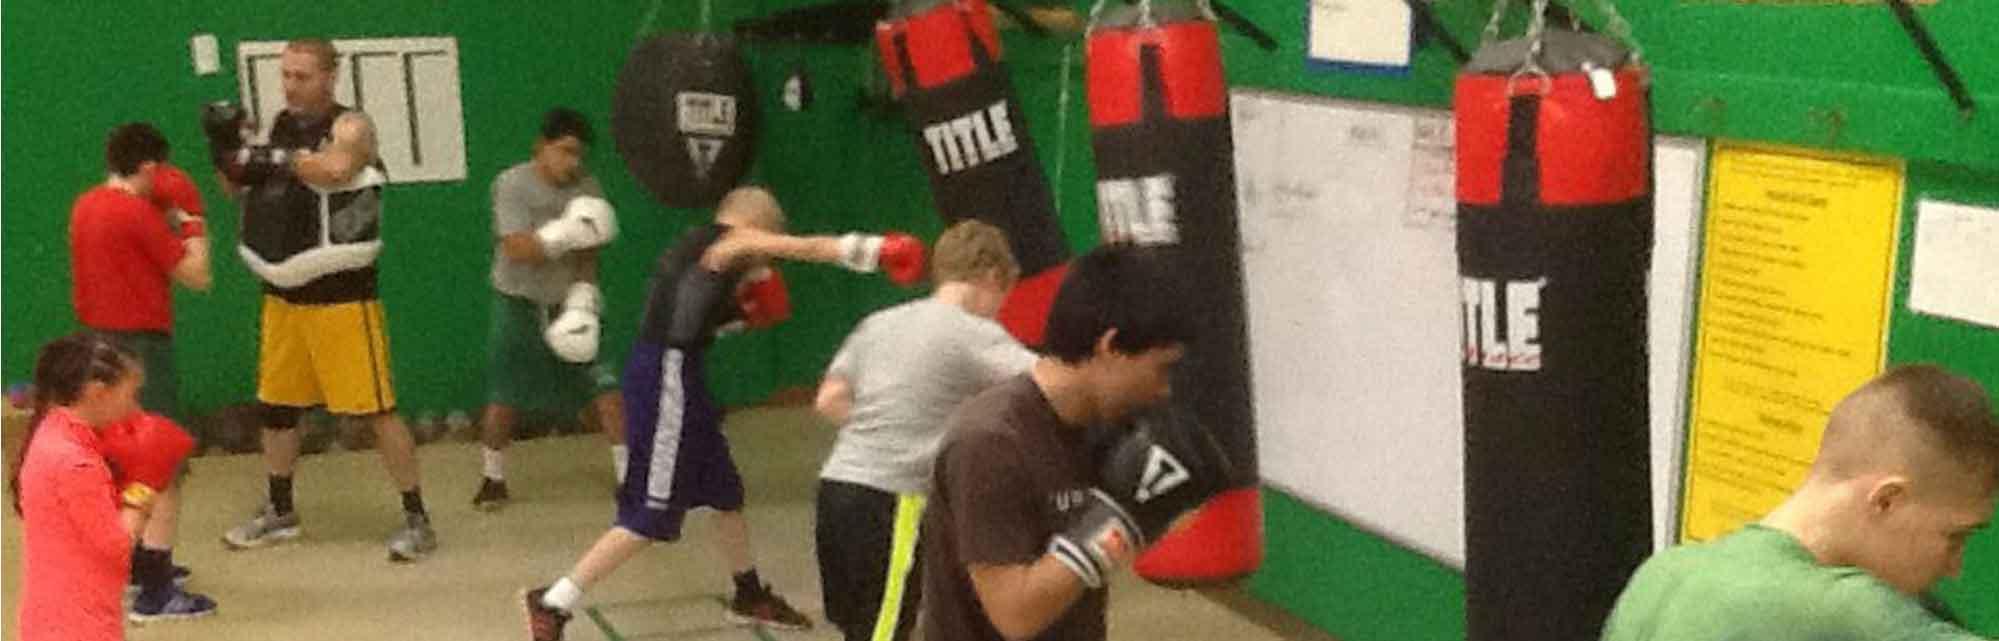 Blanc's Boxing Gym